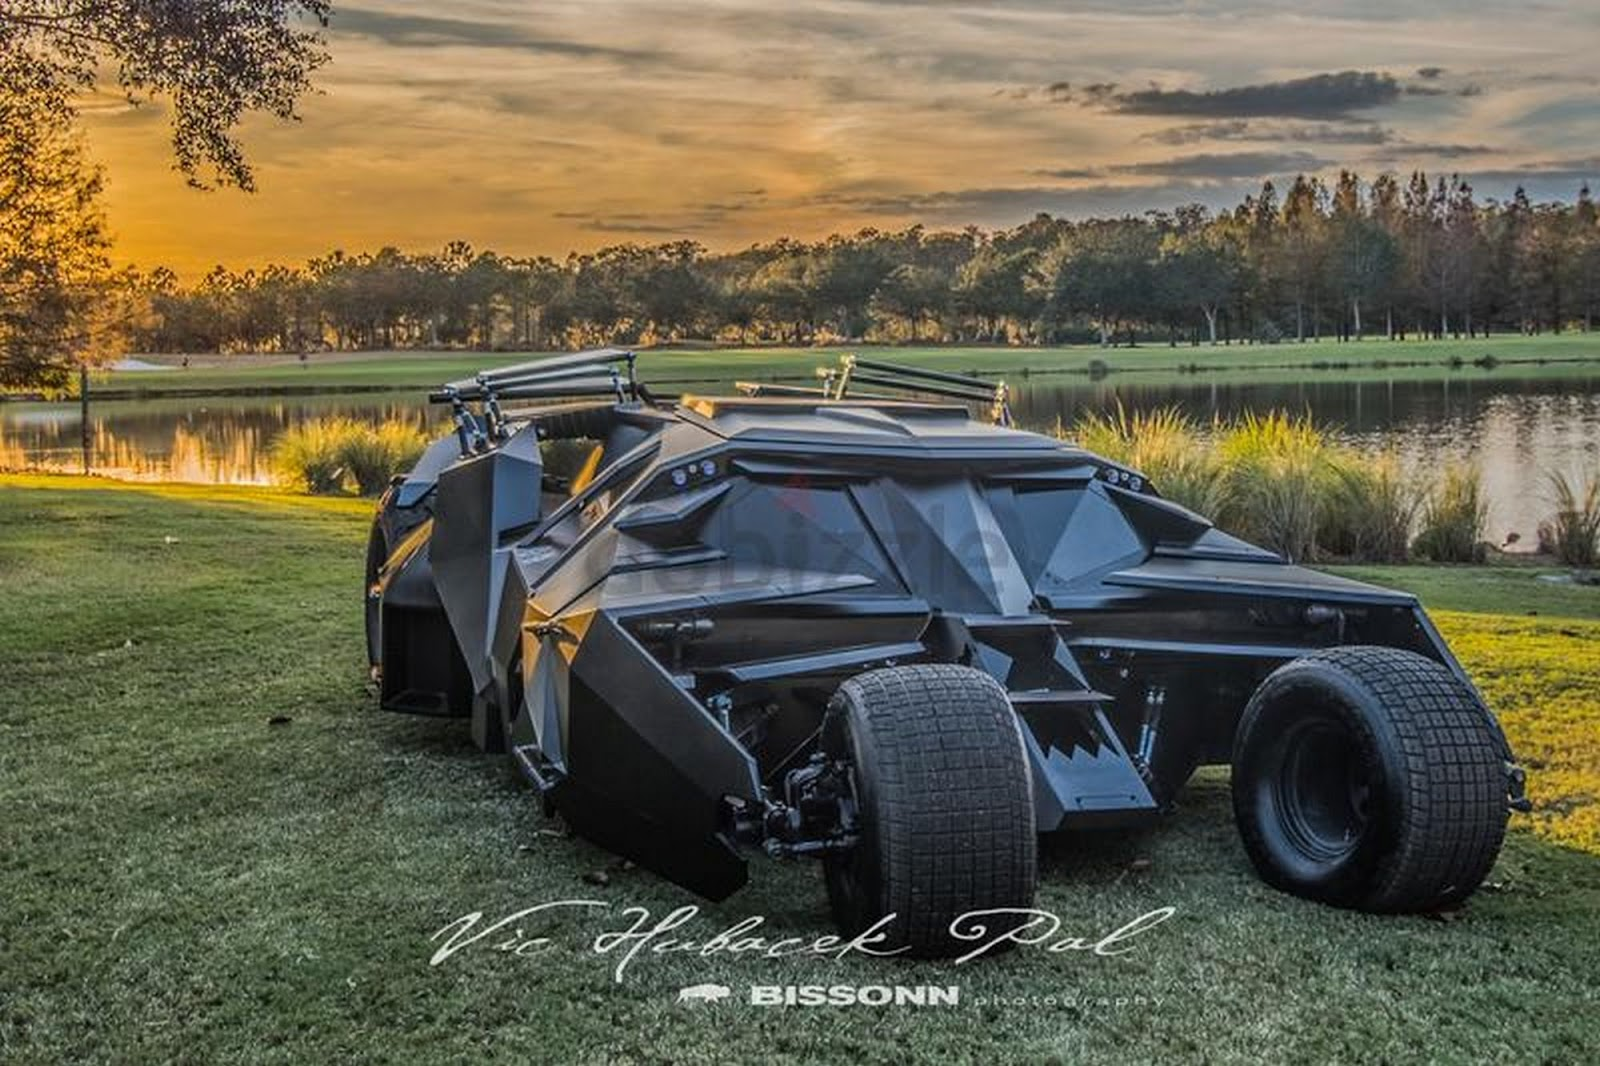 Batman's Tumbler And Justice League Batmobile Appear For Sale In Dubai